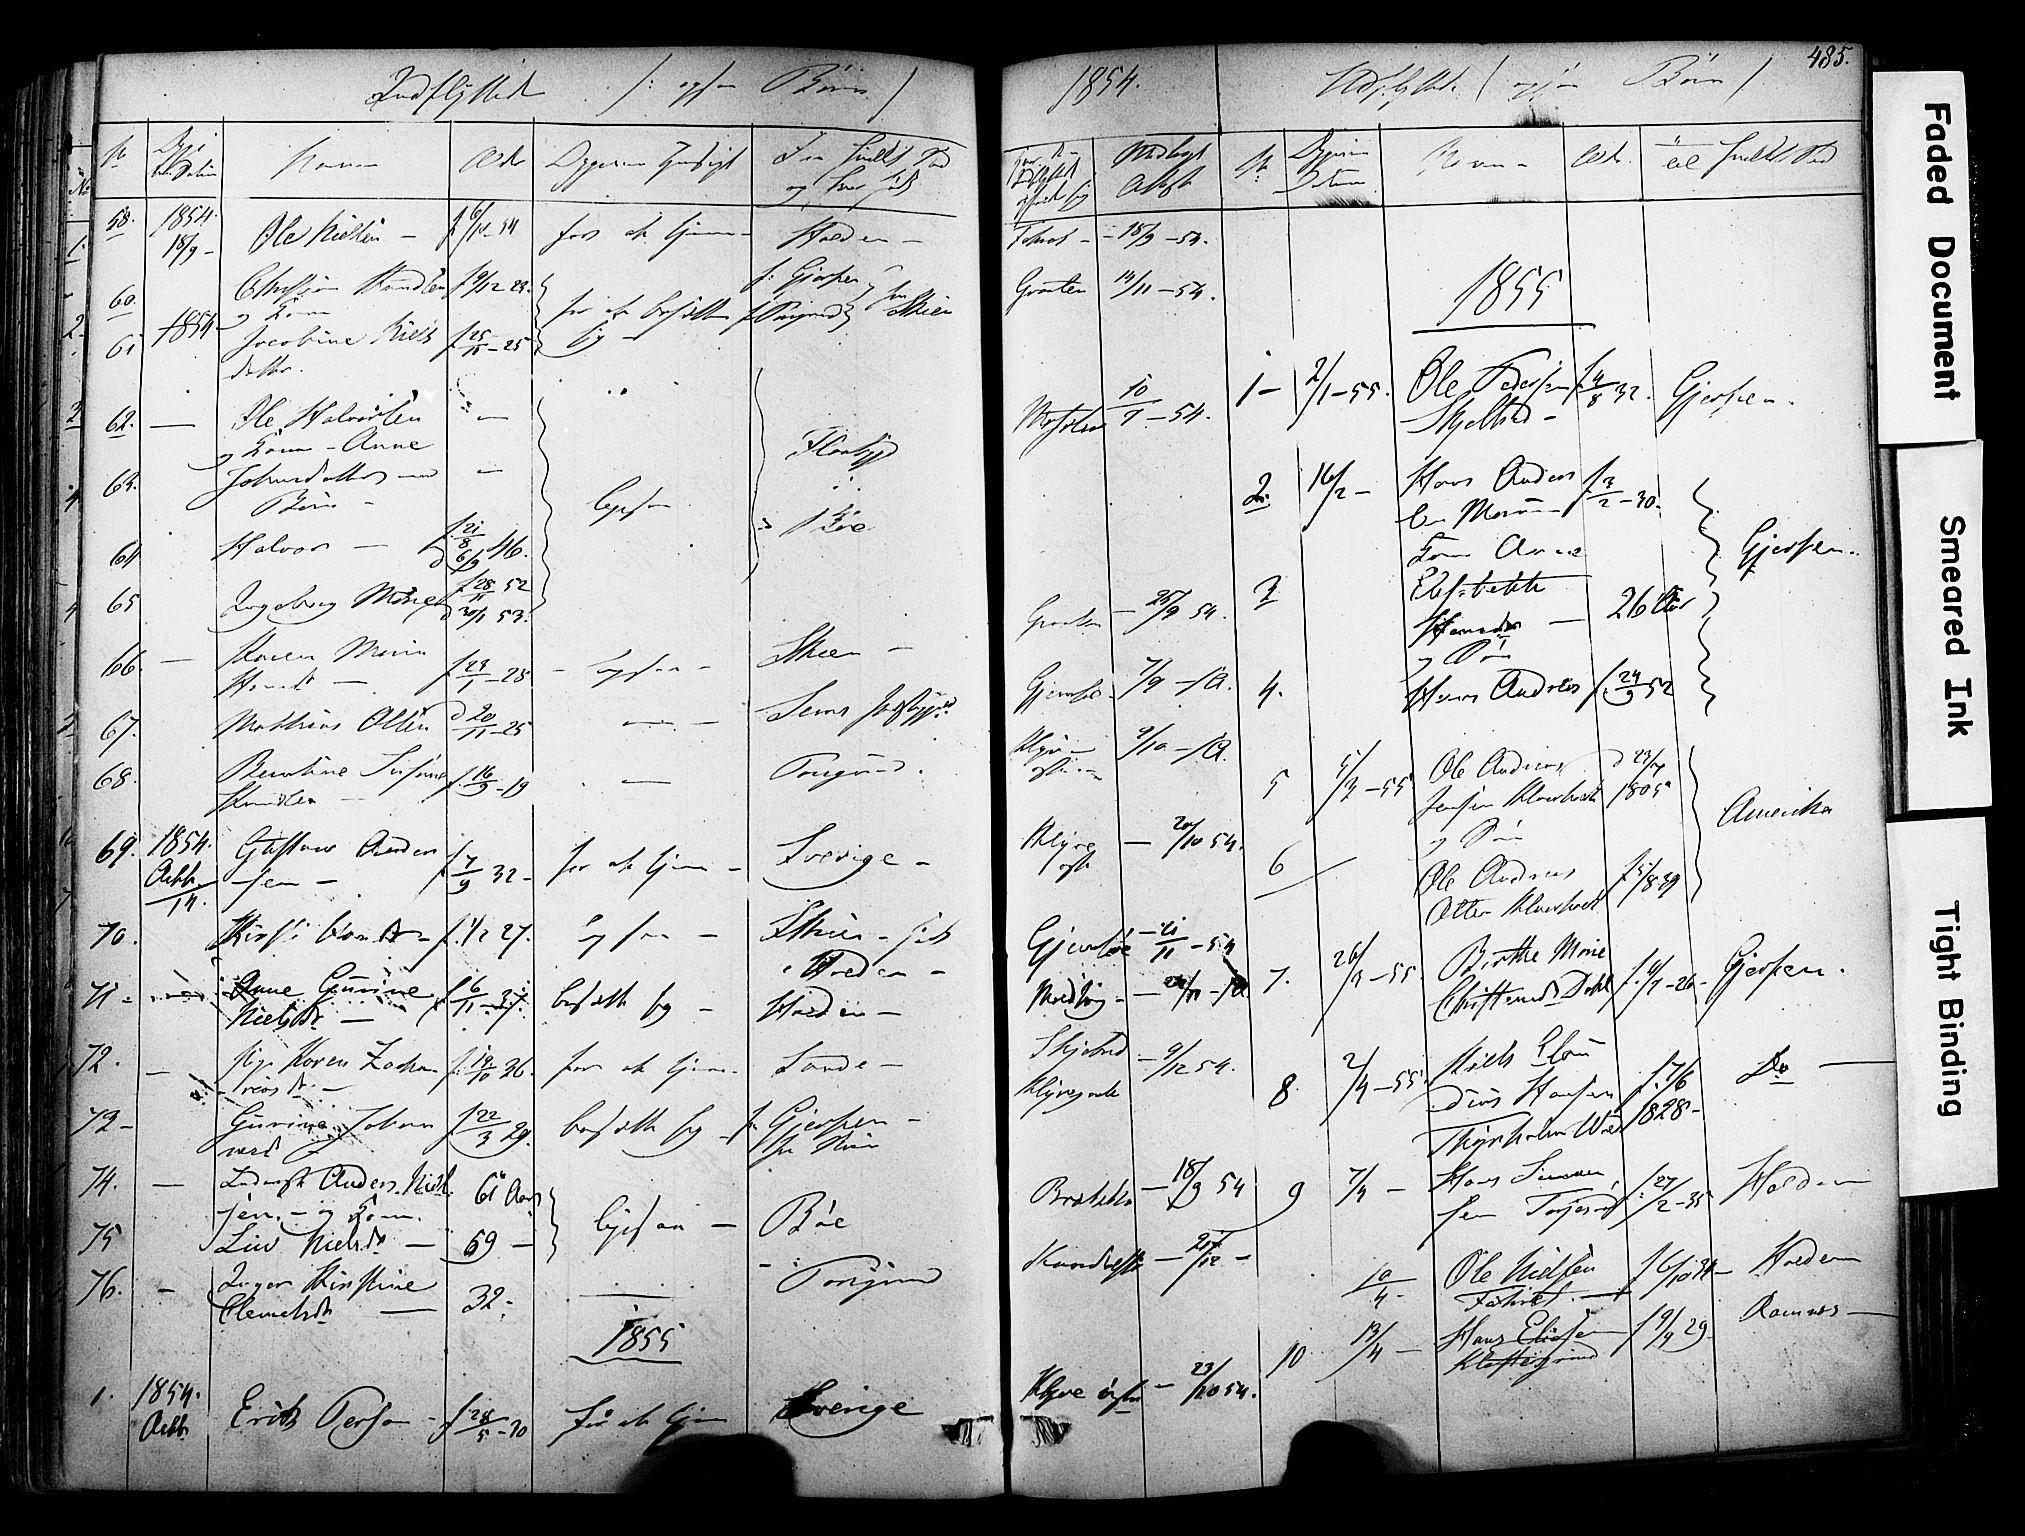 SAKO, Solum kirkebøker, F/Fa/L0006: Ministerialbok nr. I 6, 1844-1855, s. 485